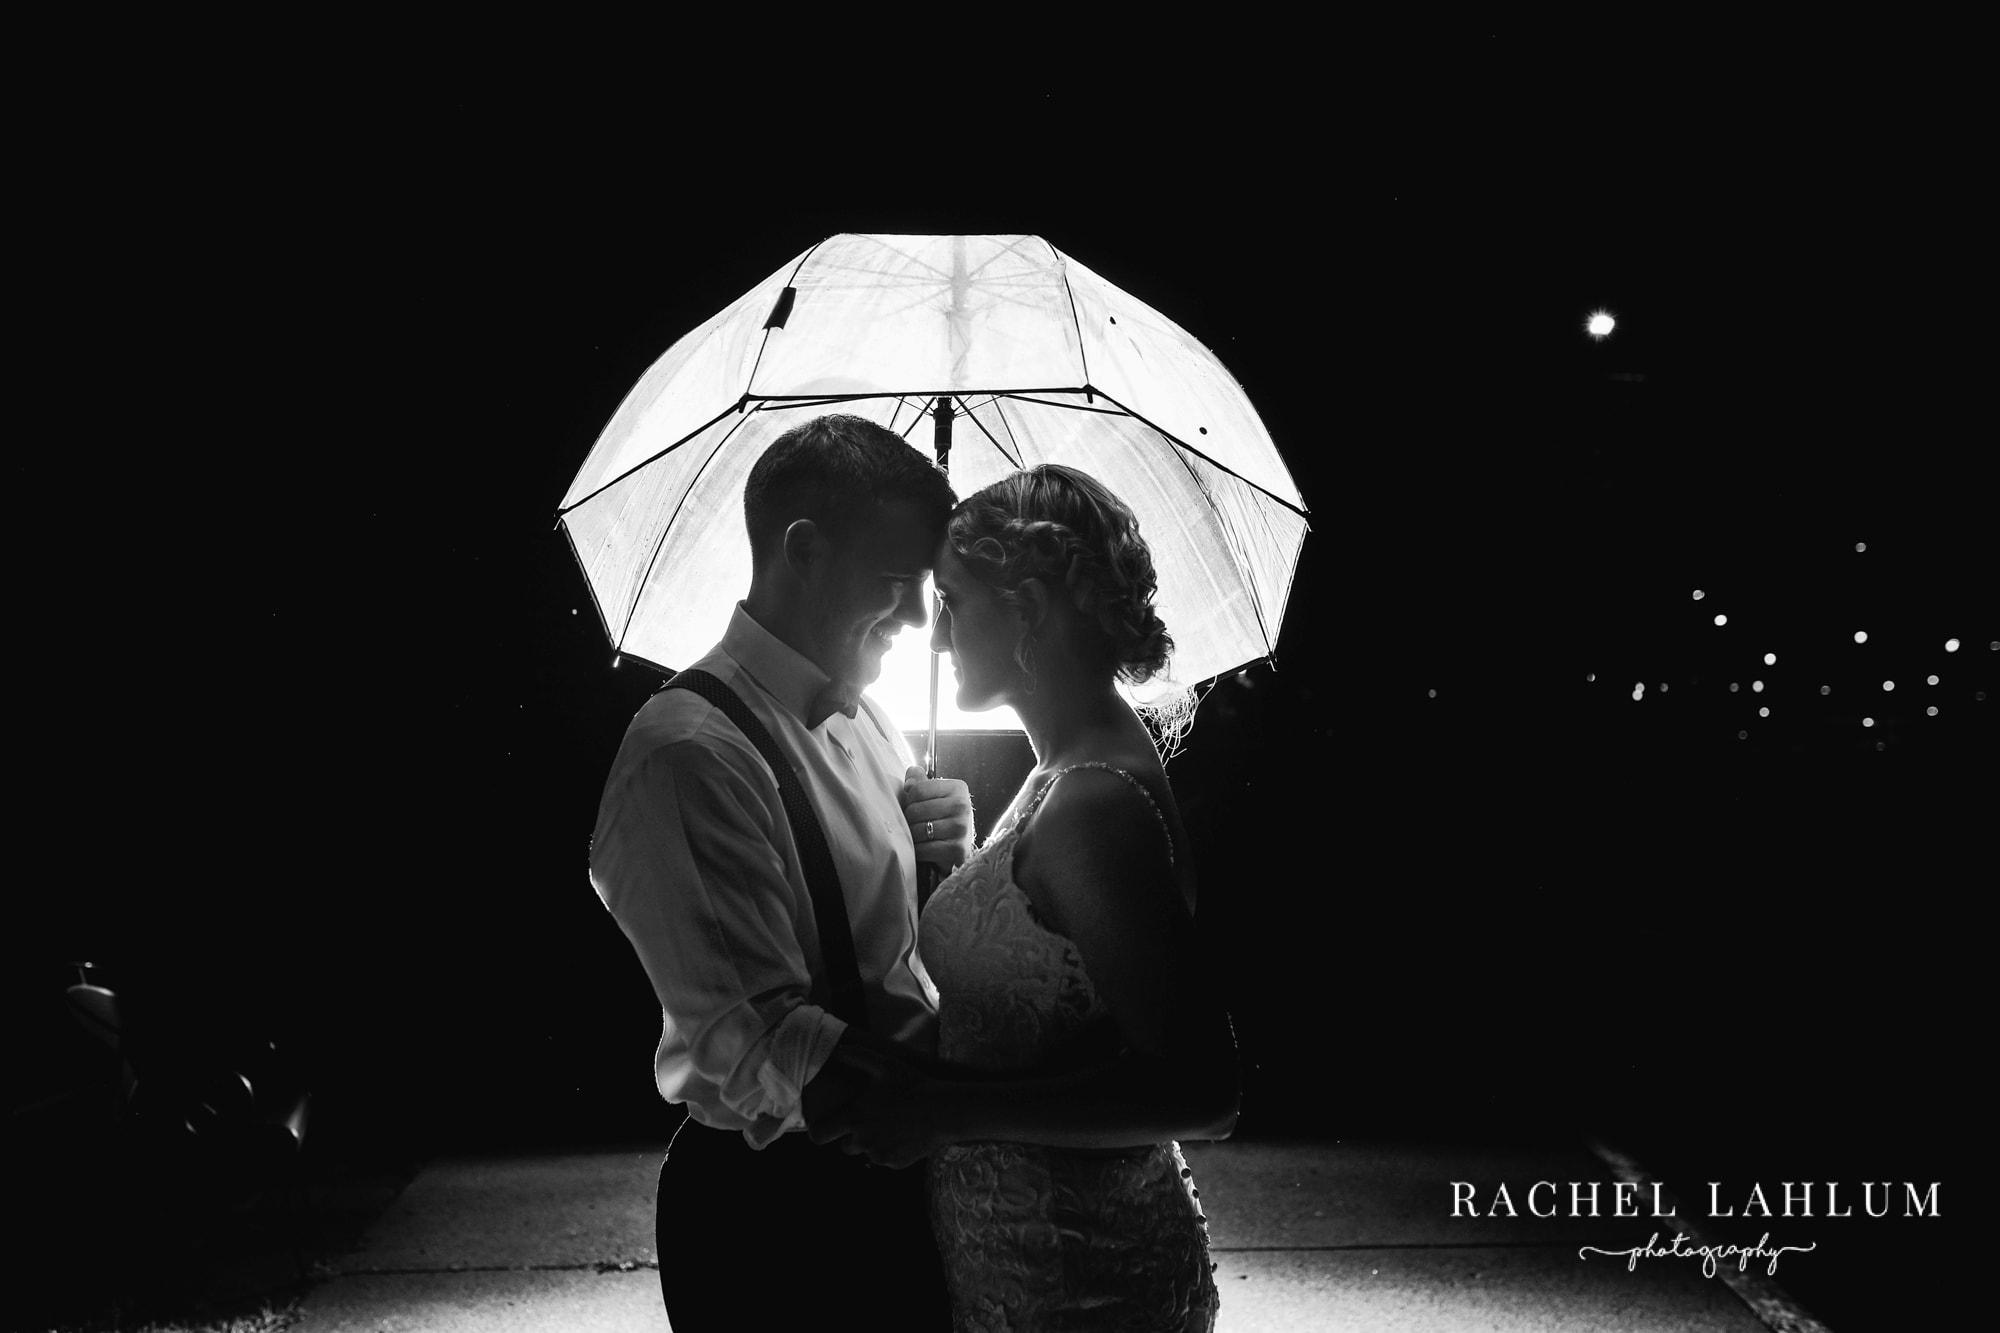 Nighttime wedding portrait of bride and groom at The Metropolitan Club & Ballroom.